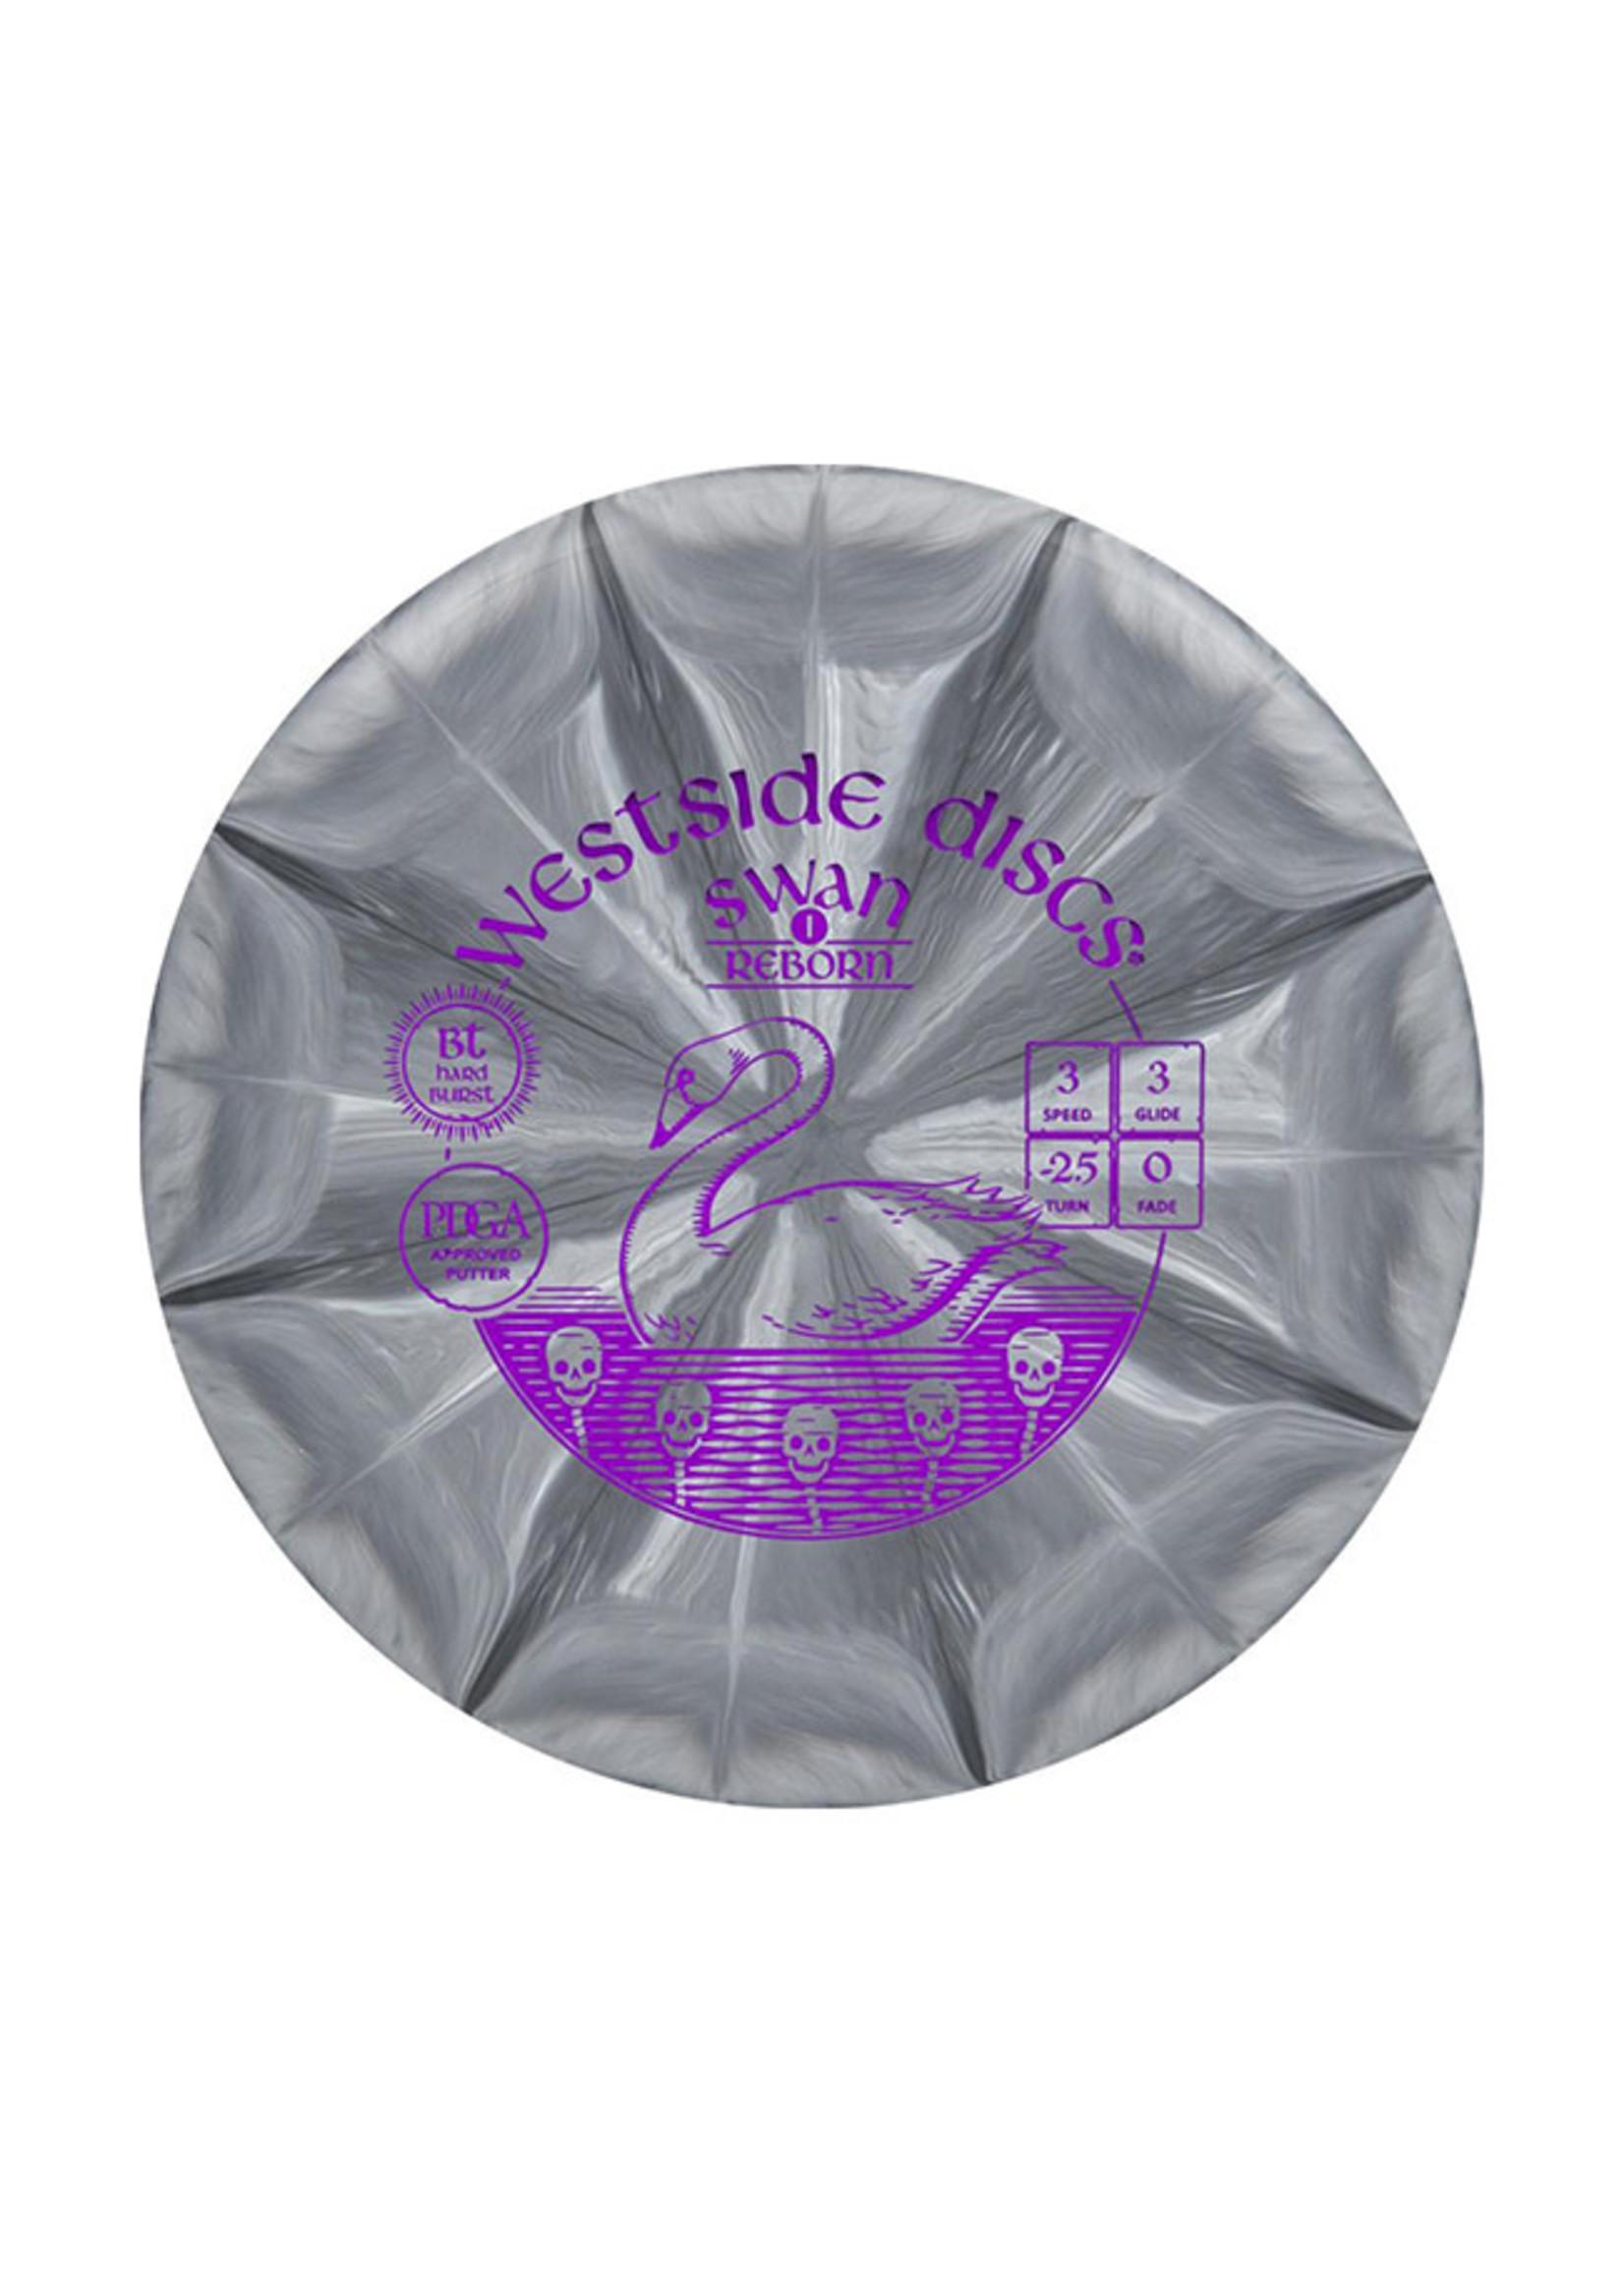 Westside Discs Westside Discs Swan 1 Reborn Putter